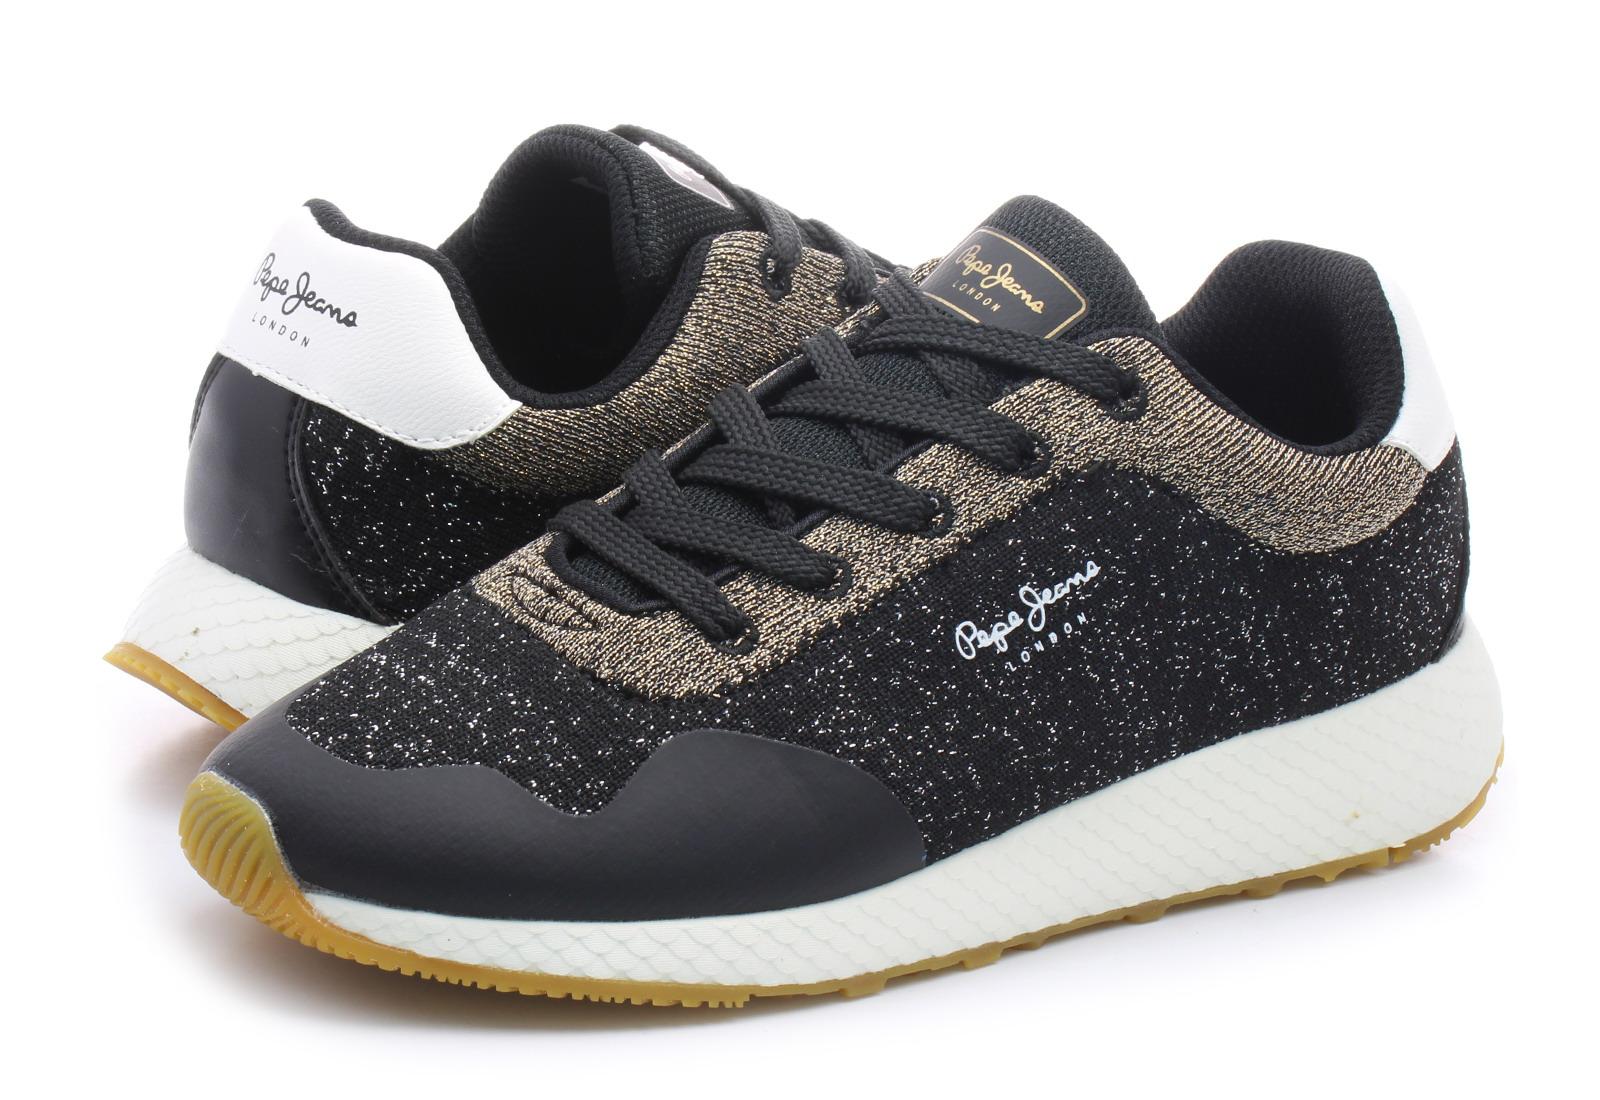 Pepe Jeans Shoes - Koko - PLS30792999 - Online shop for sneakers ... 2908dee09f